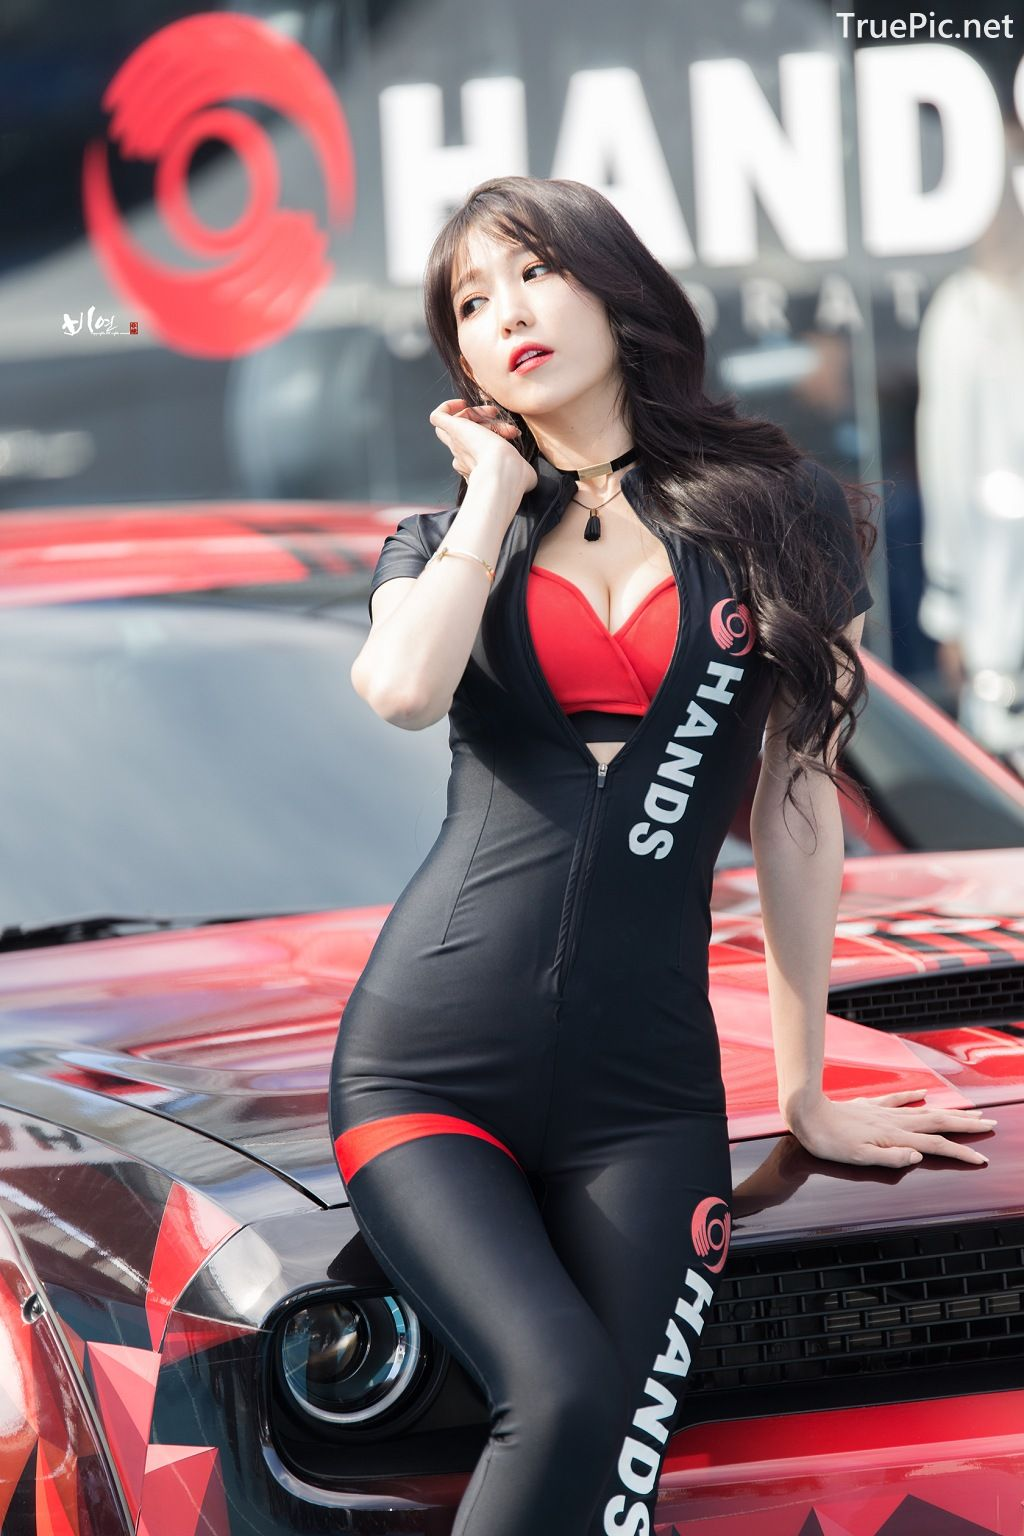 Image-Korean-Racing-Model-Lee-Eun-Hye-At-Incheon-Korea-Tuning-Festival-TruePic.net- Picture-6